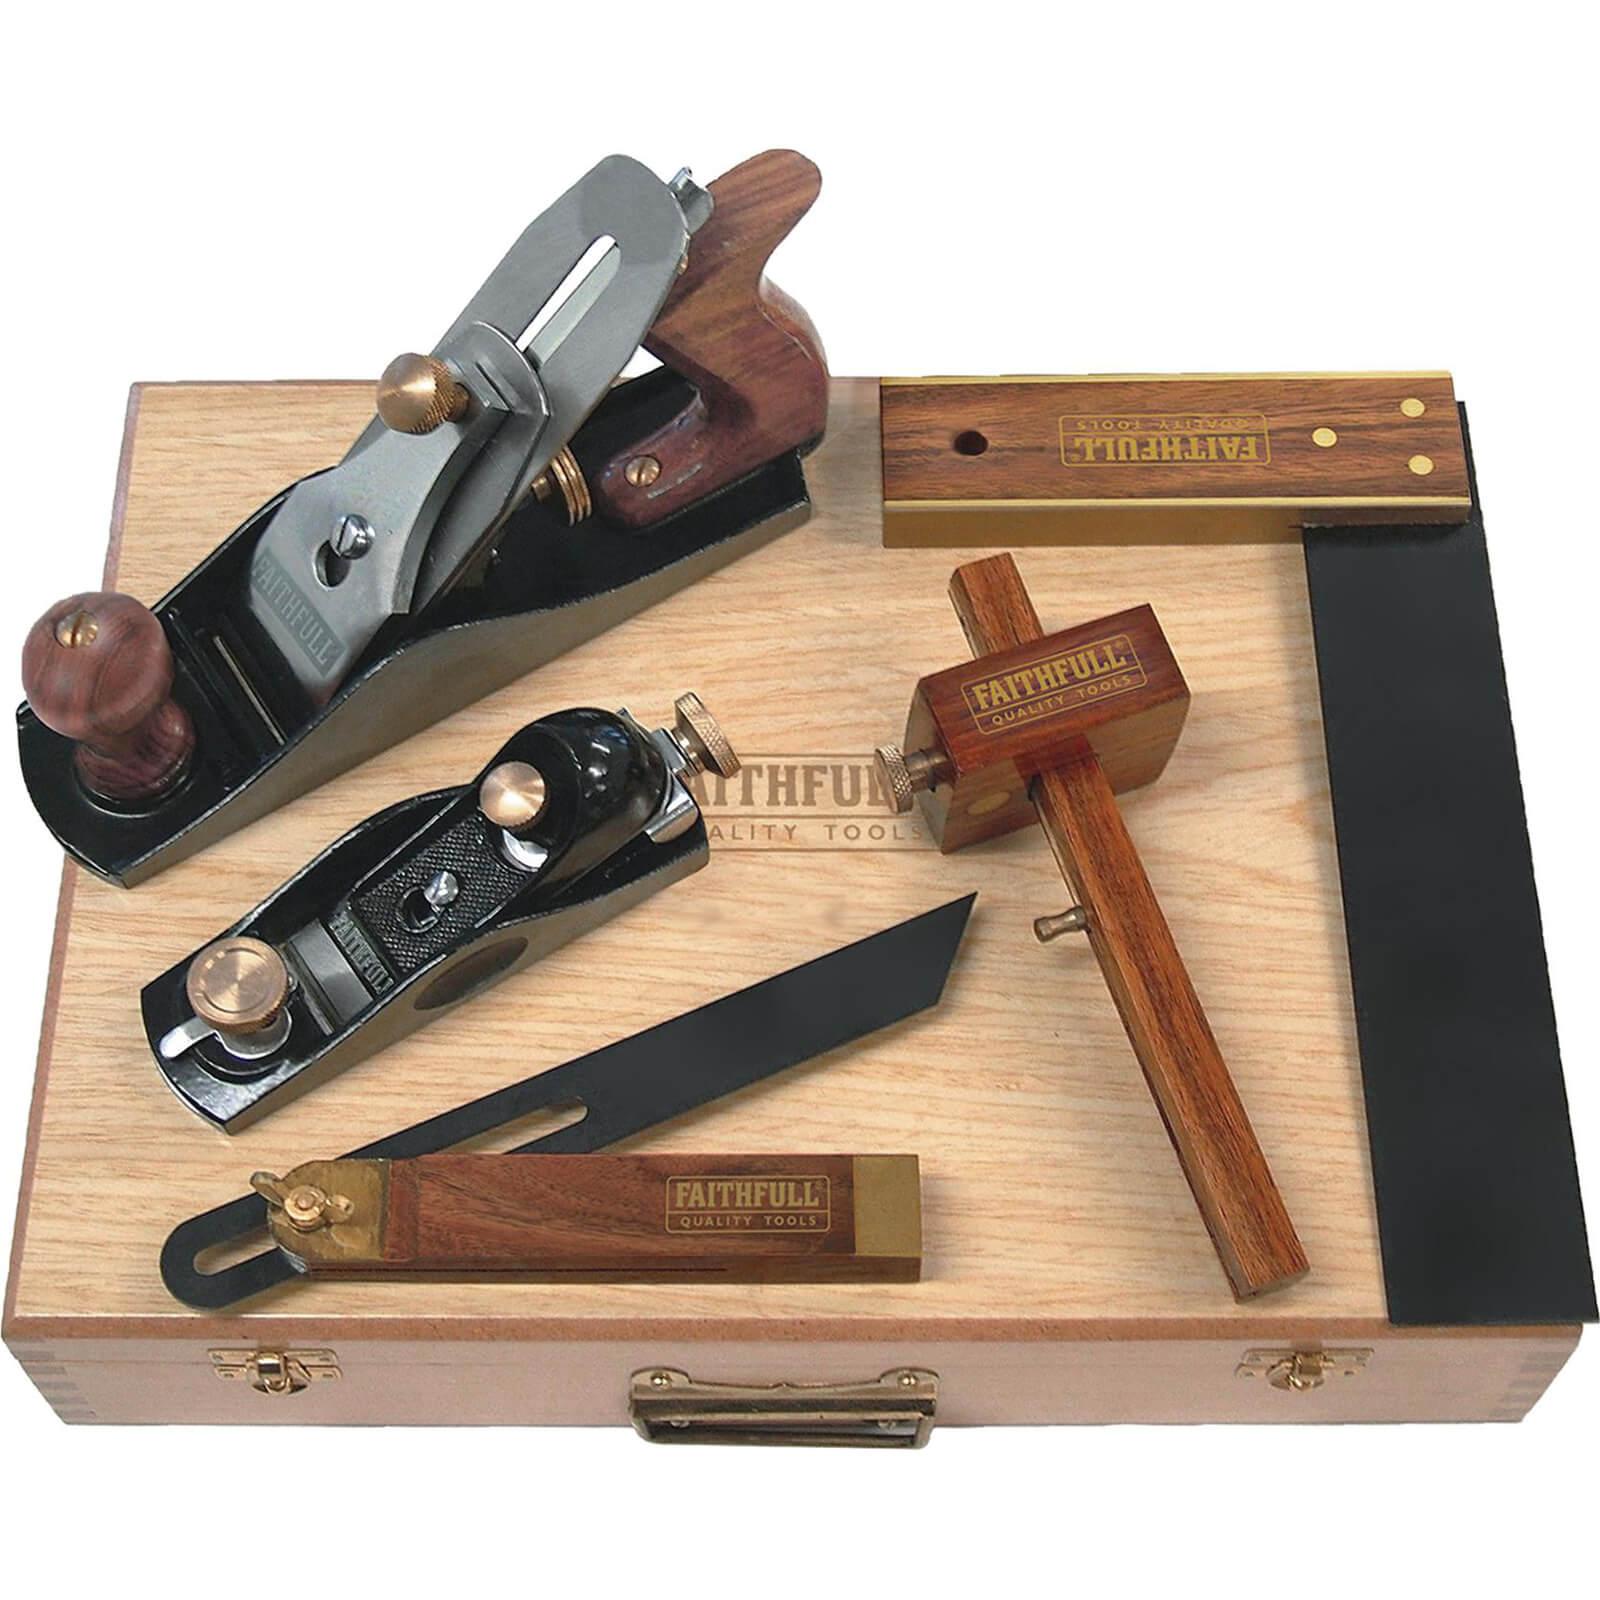 Image of Faithfull 5 Piece Carpenters Woodworking Tool Kit